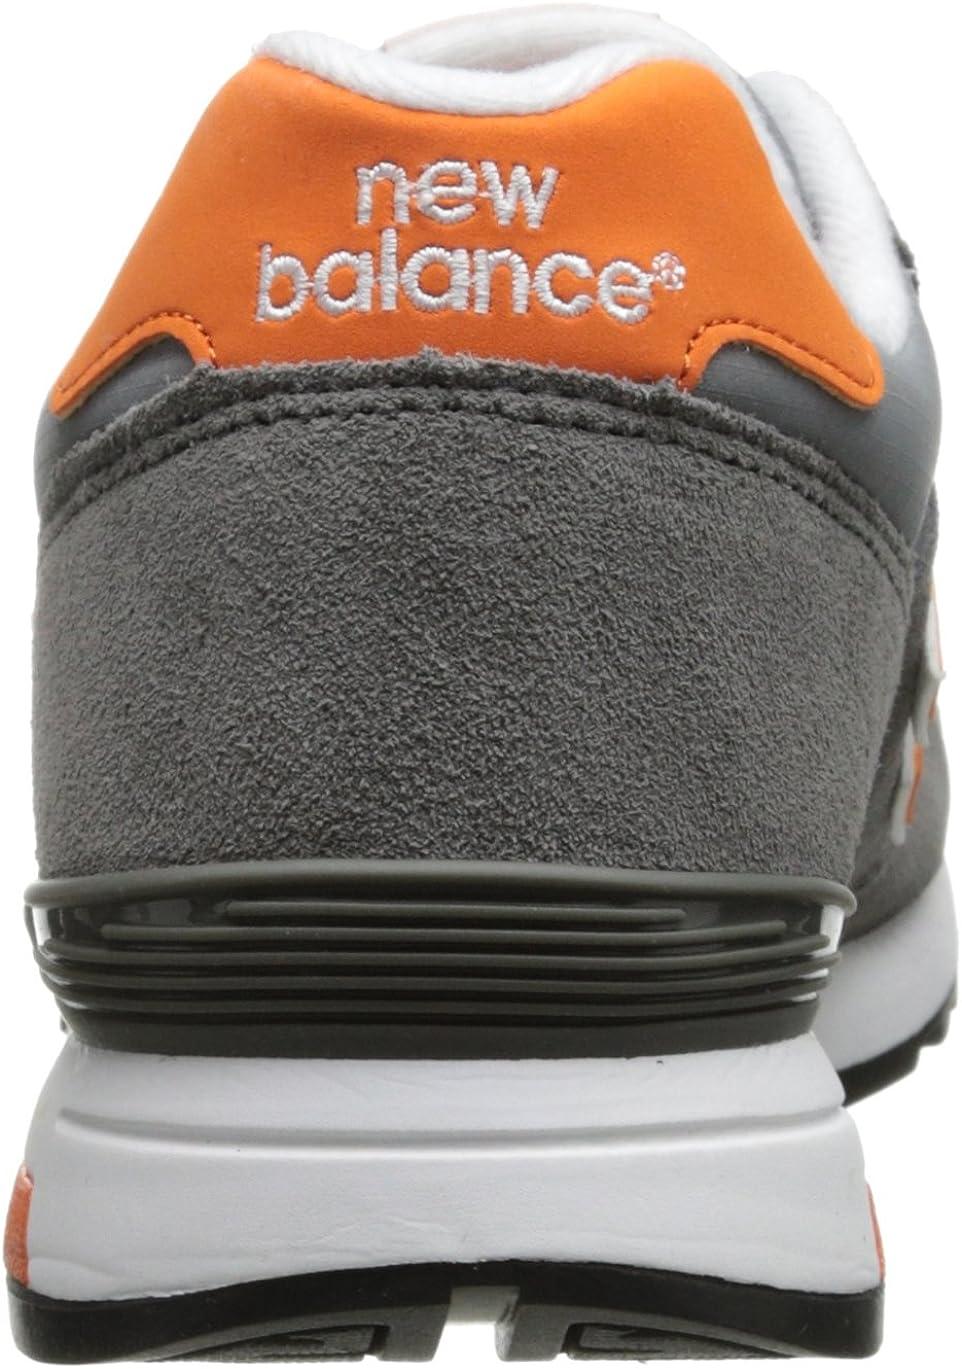 Amazon.com: New Balance Men's ML565 Classic Fashion Sneaker ...